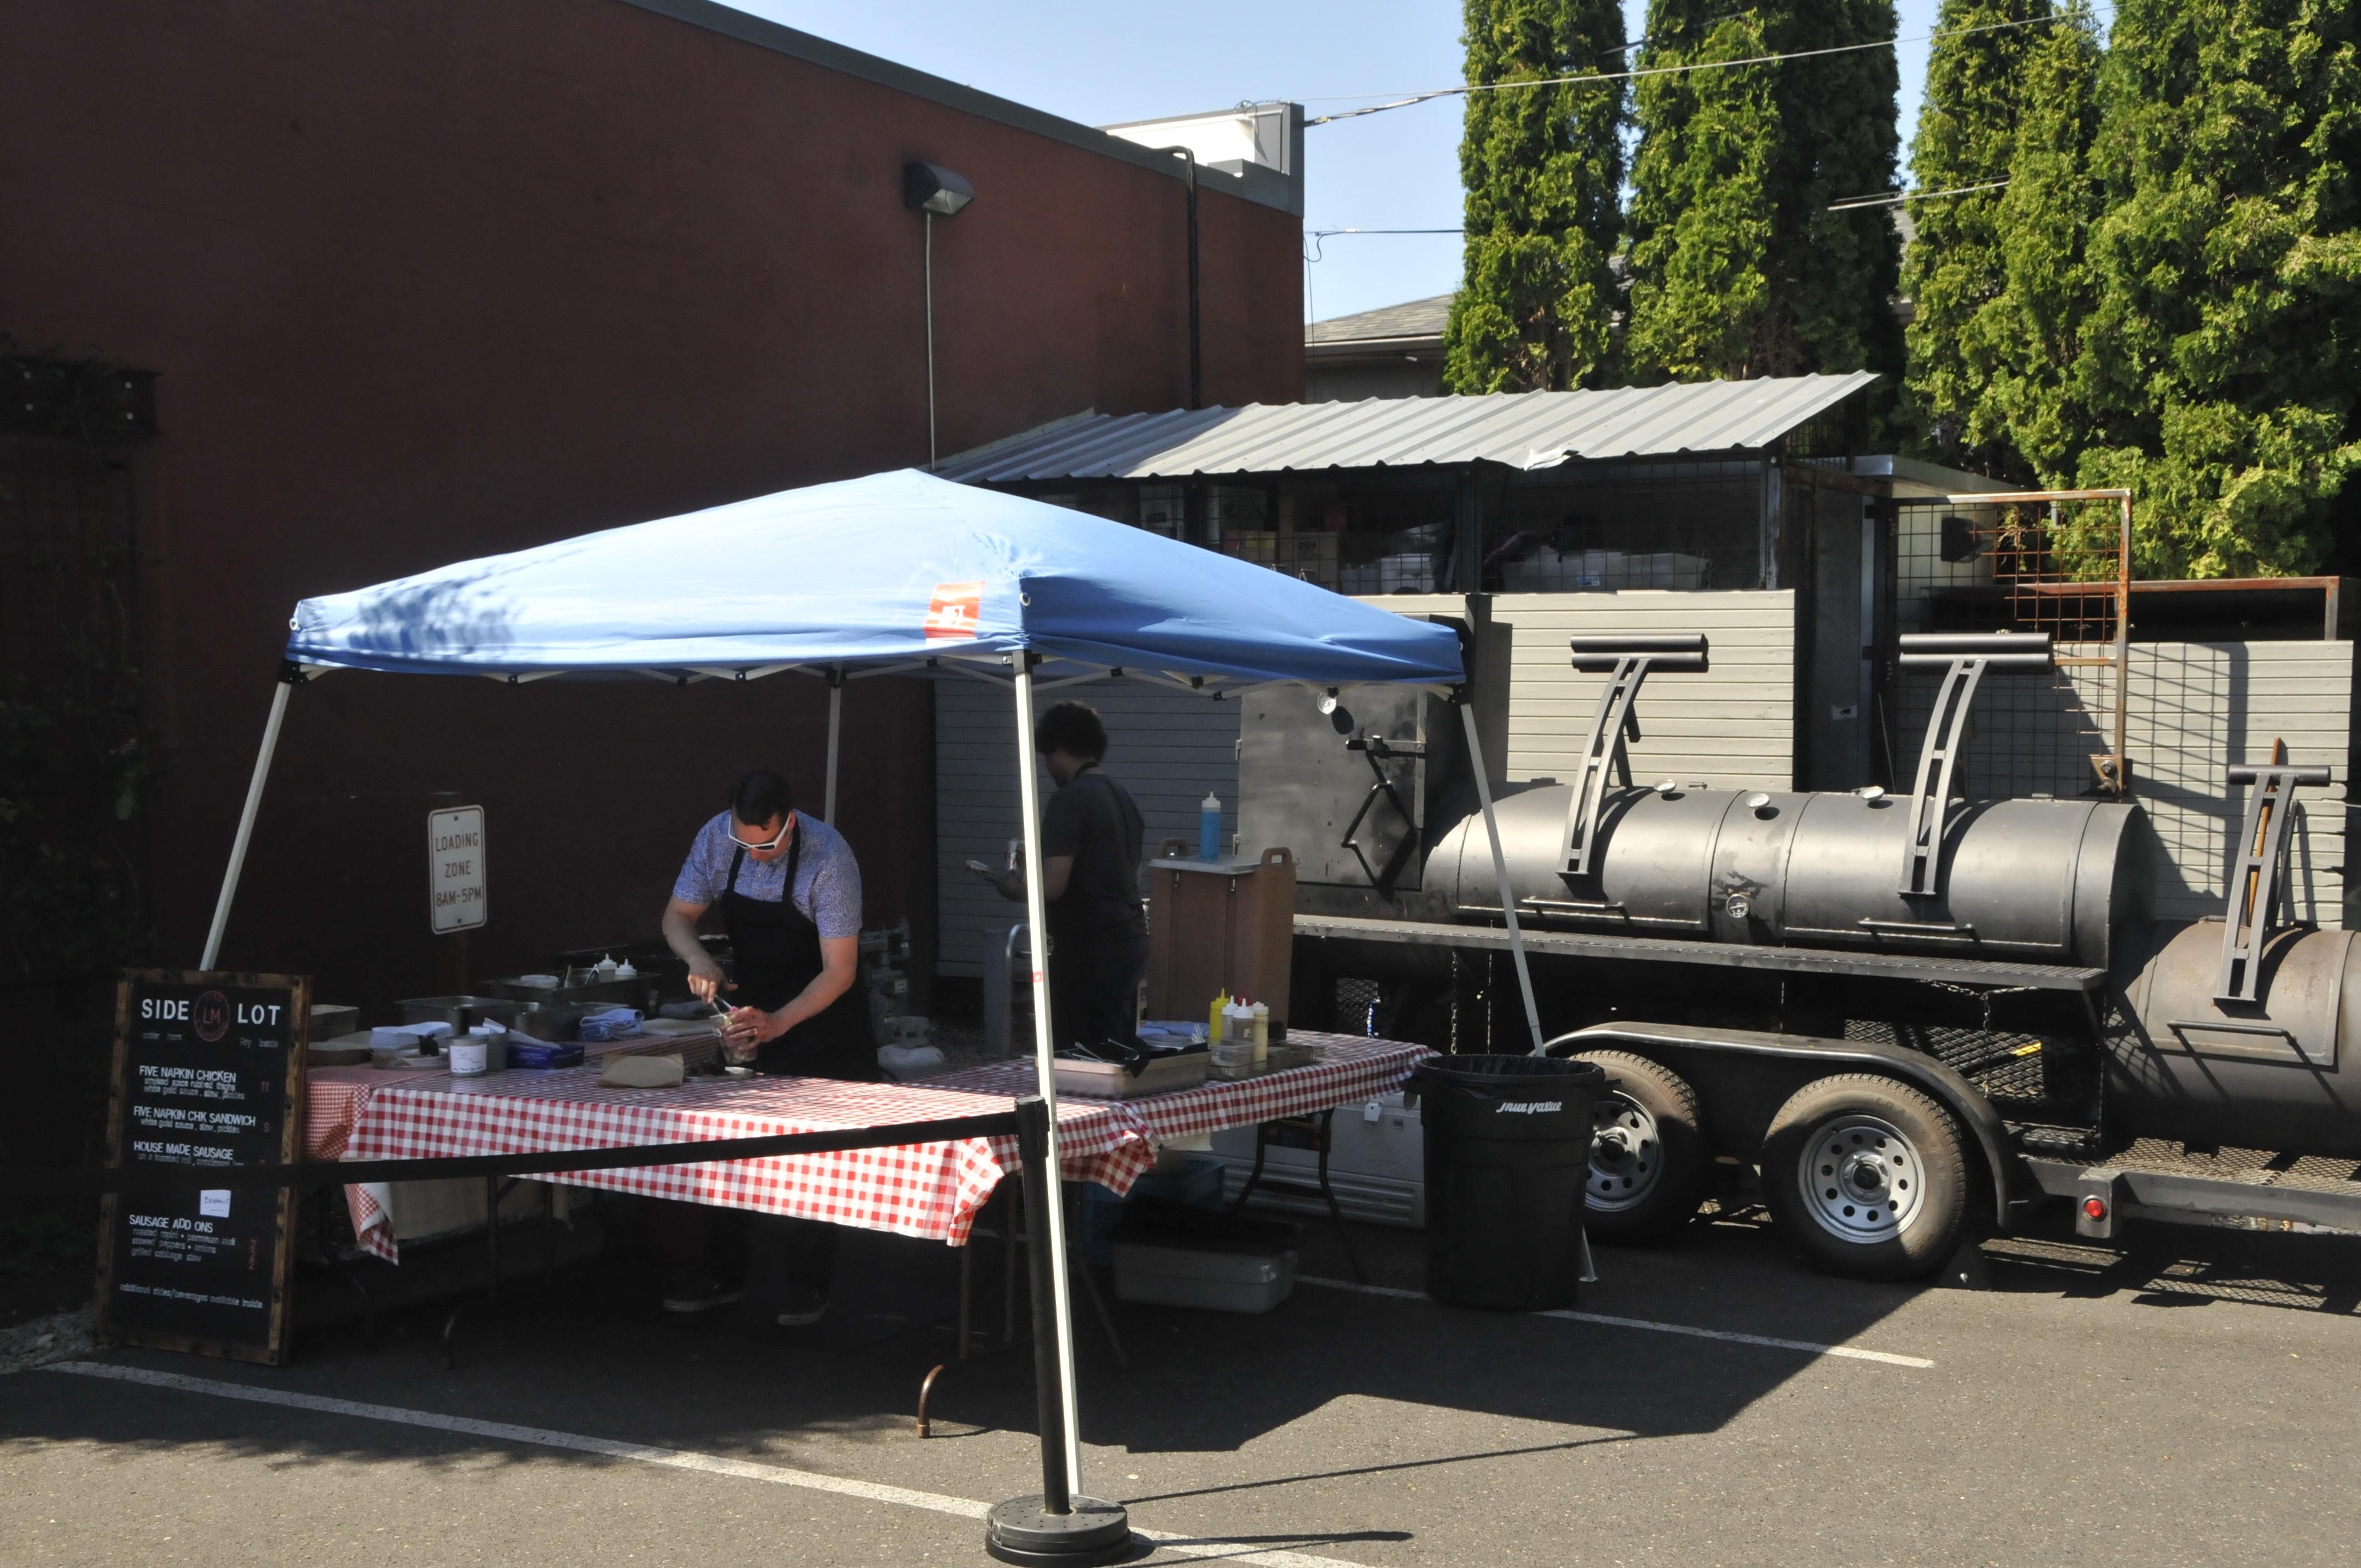 Laurelhurst Market's new outdoor setup